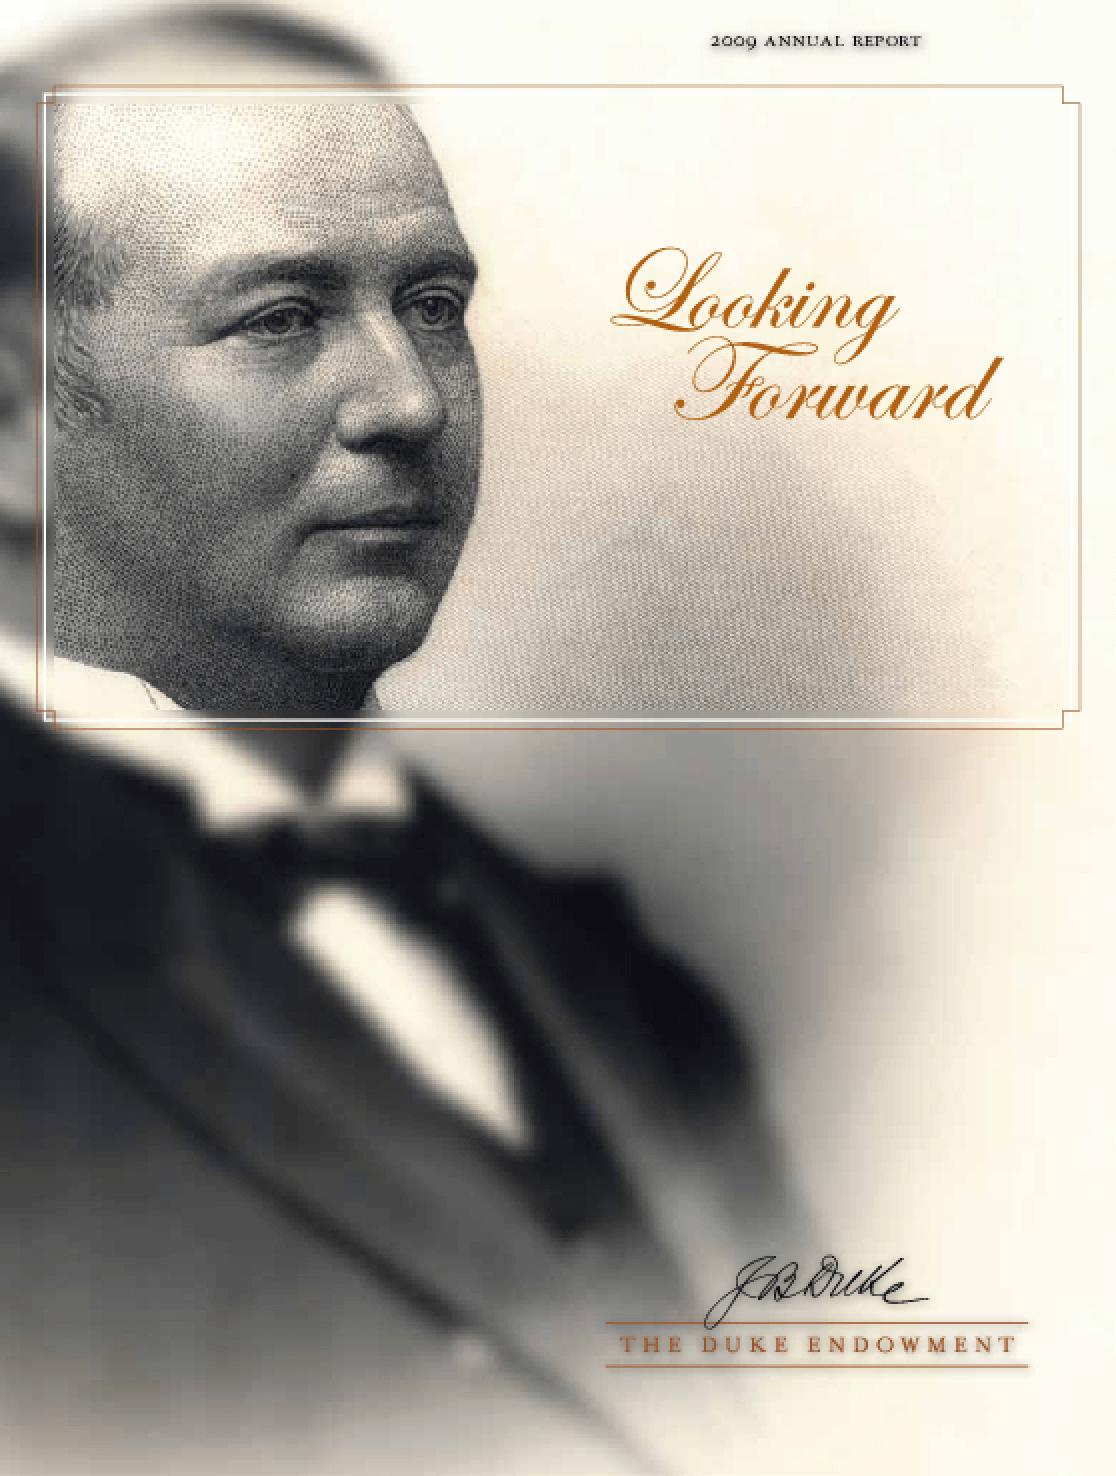 Duke Endowment - 2009 Annual Report: Looking Forward